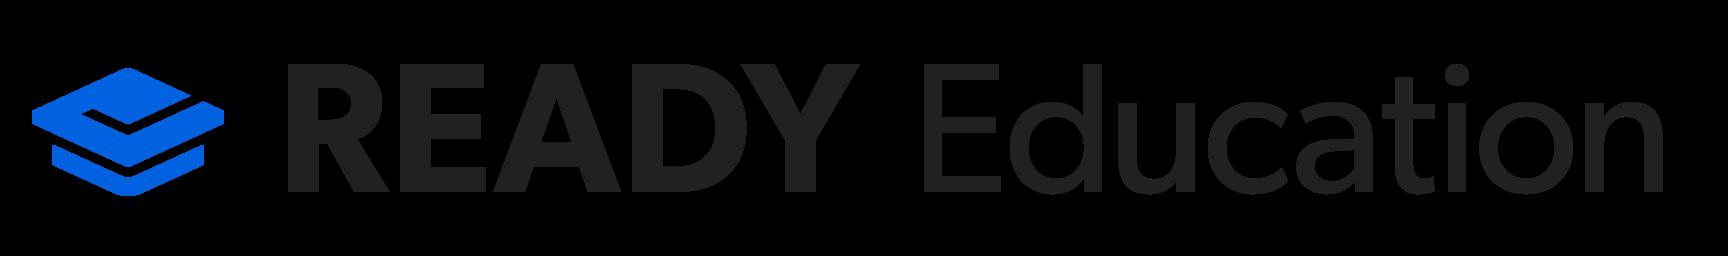 Ready Education Student Engagement Platform - Logo Color